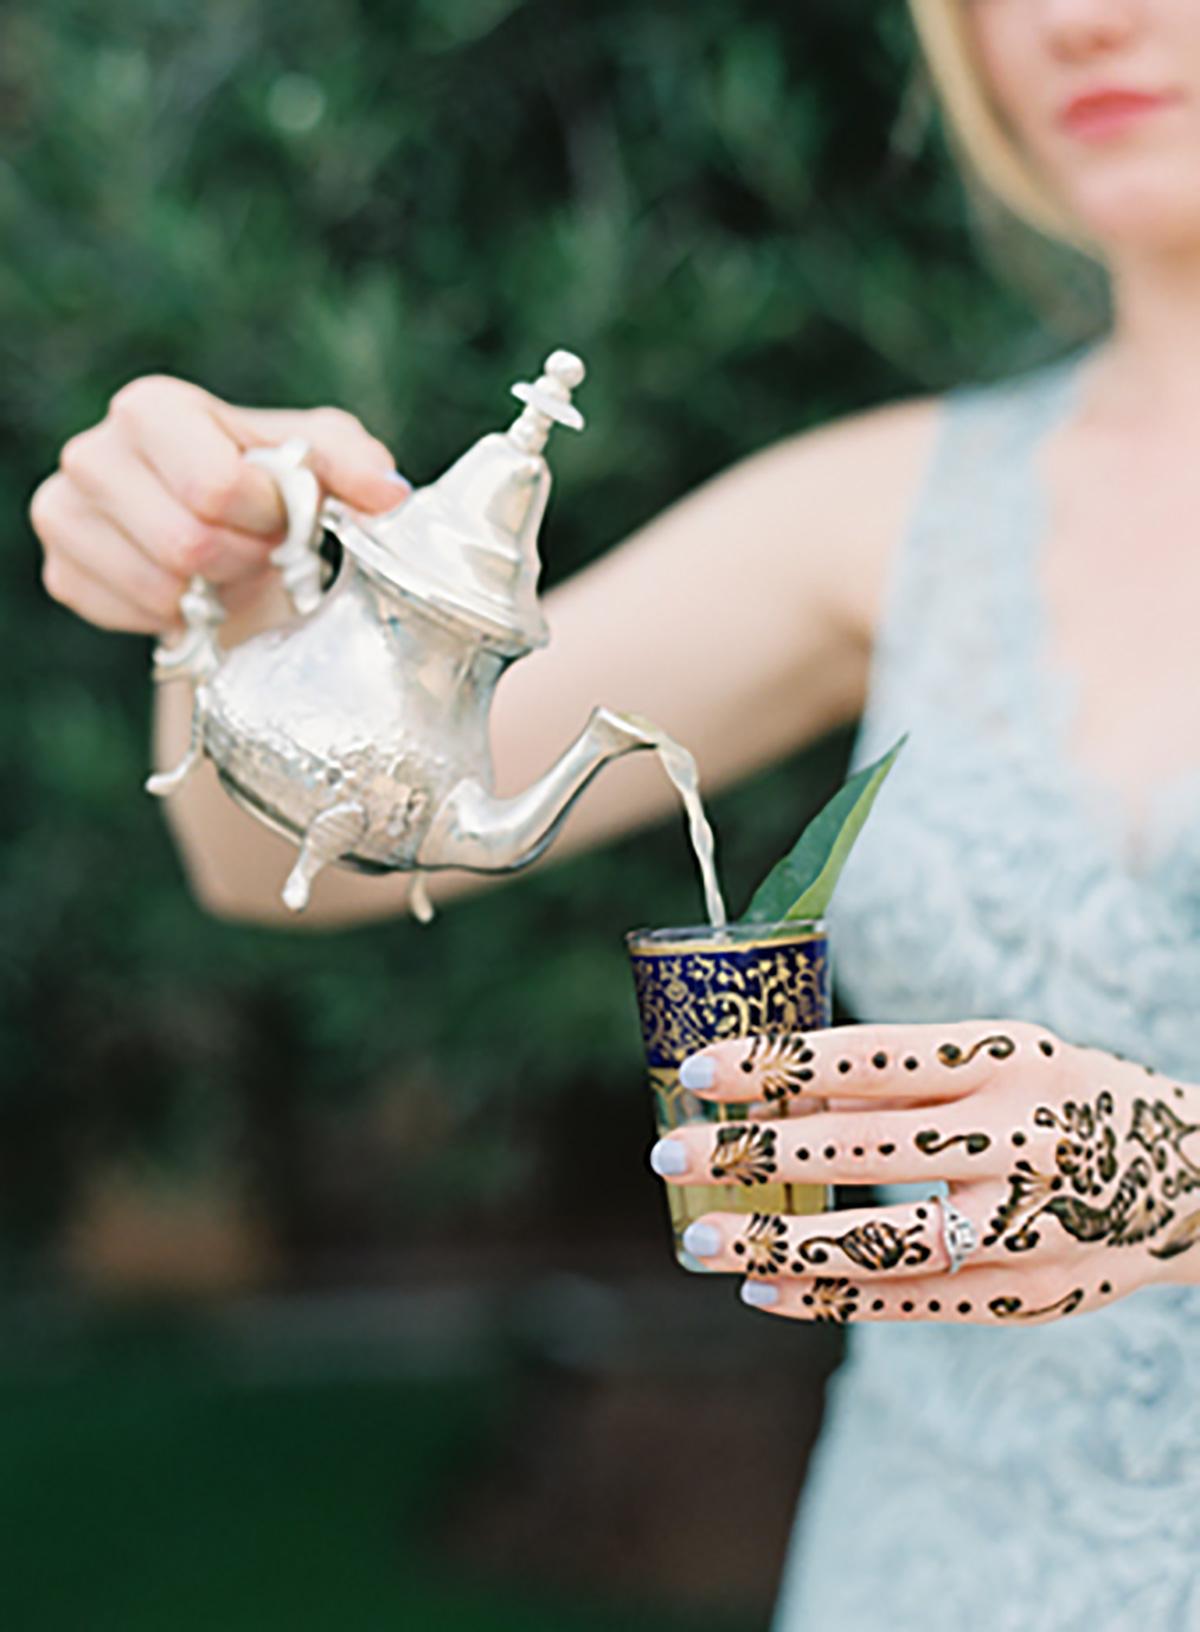 Image: PP. Fresh mint tea